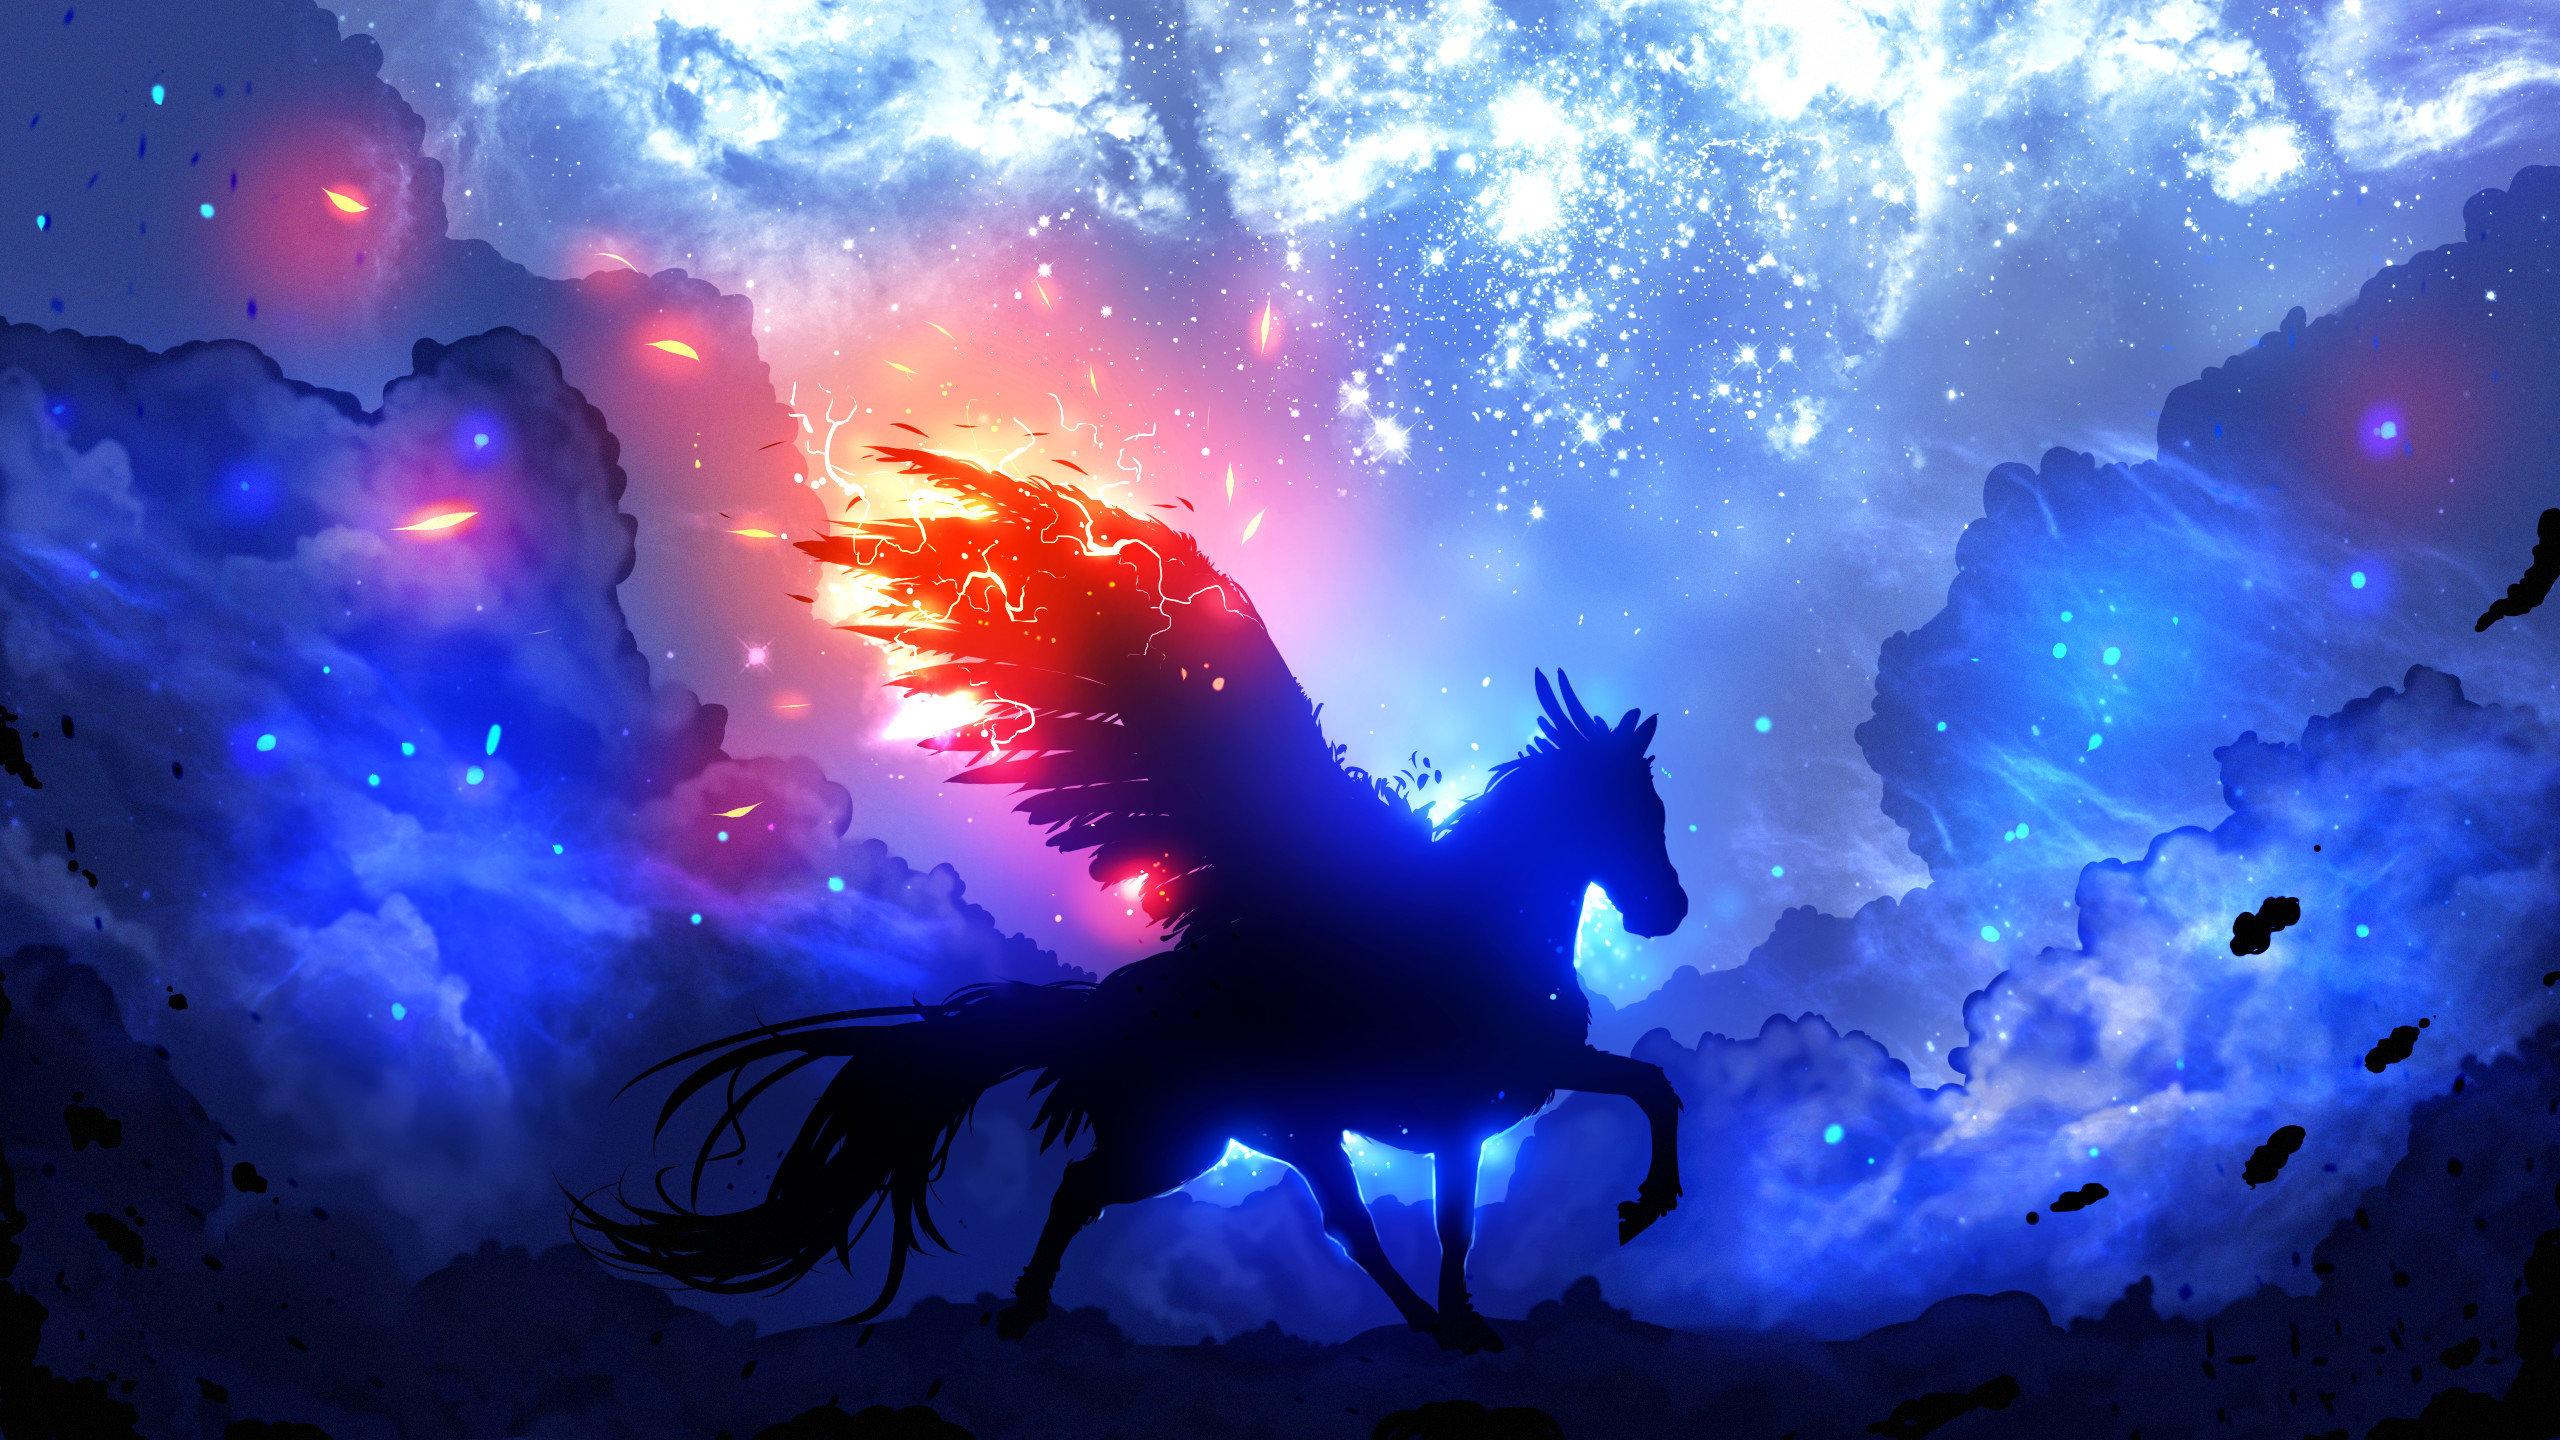 download hd 2560x1440 horse fantasy desktop background id:282530 for